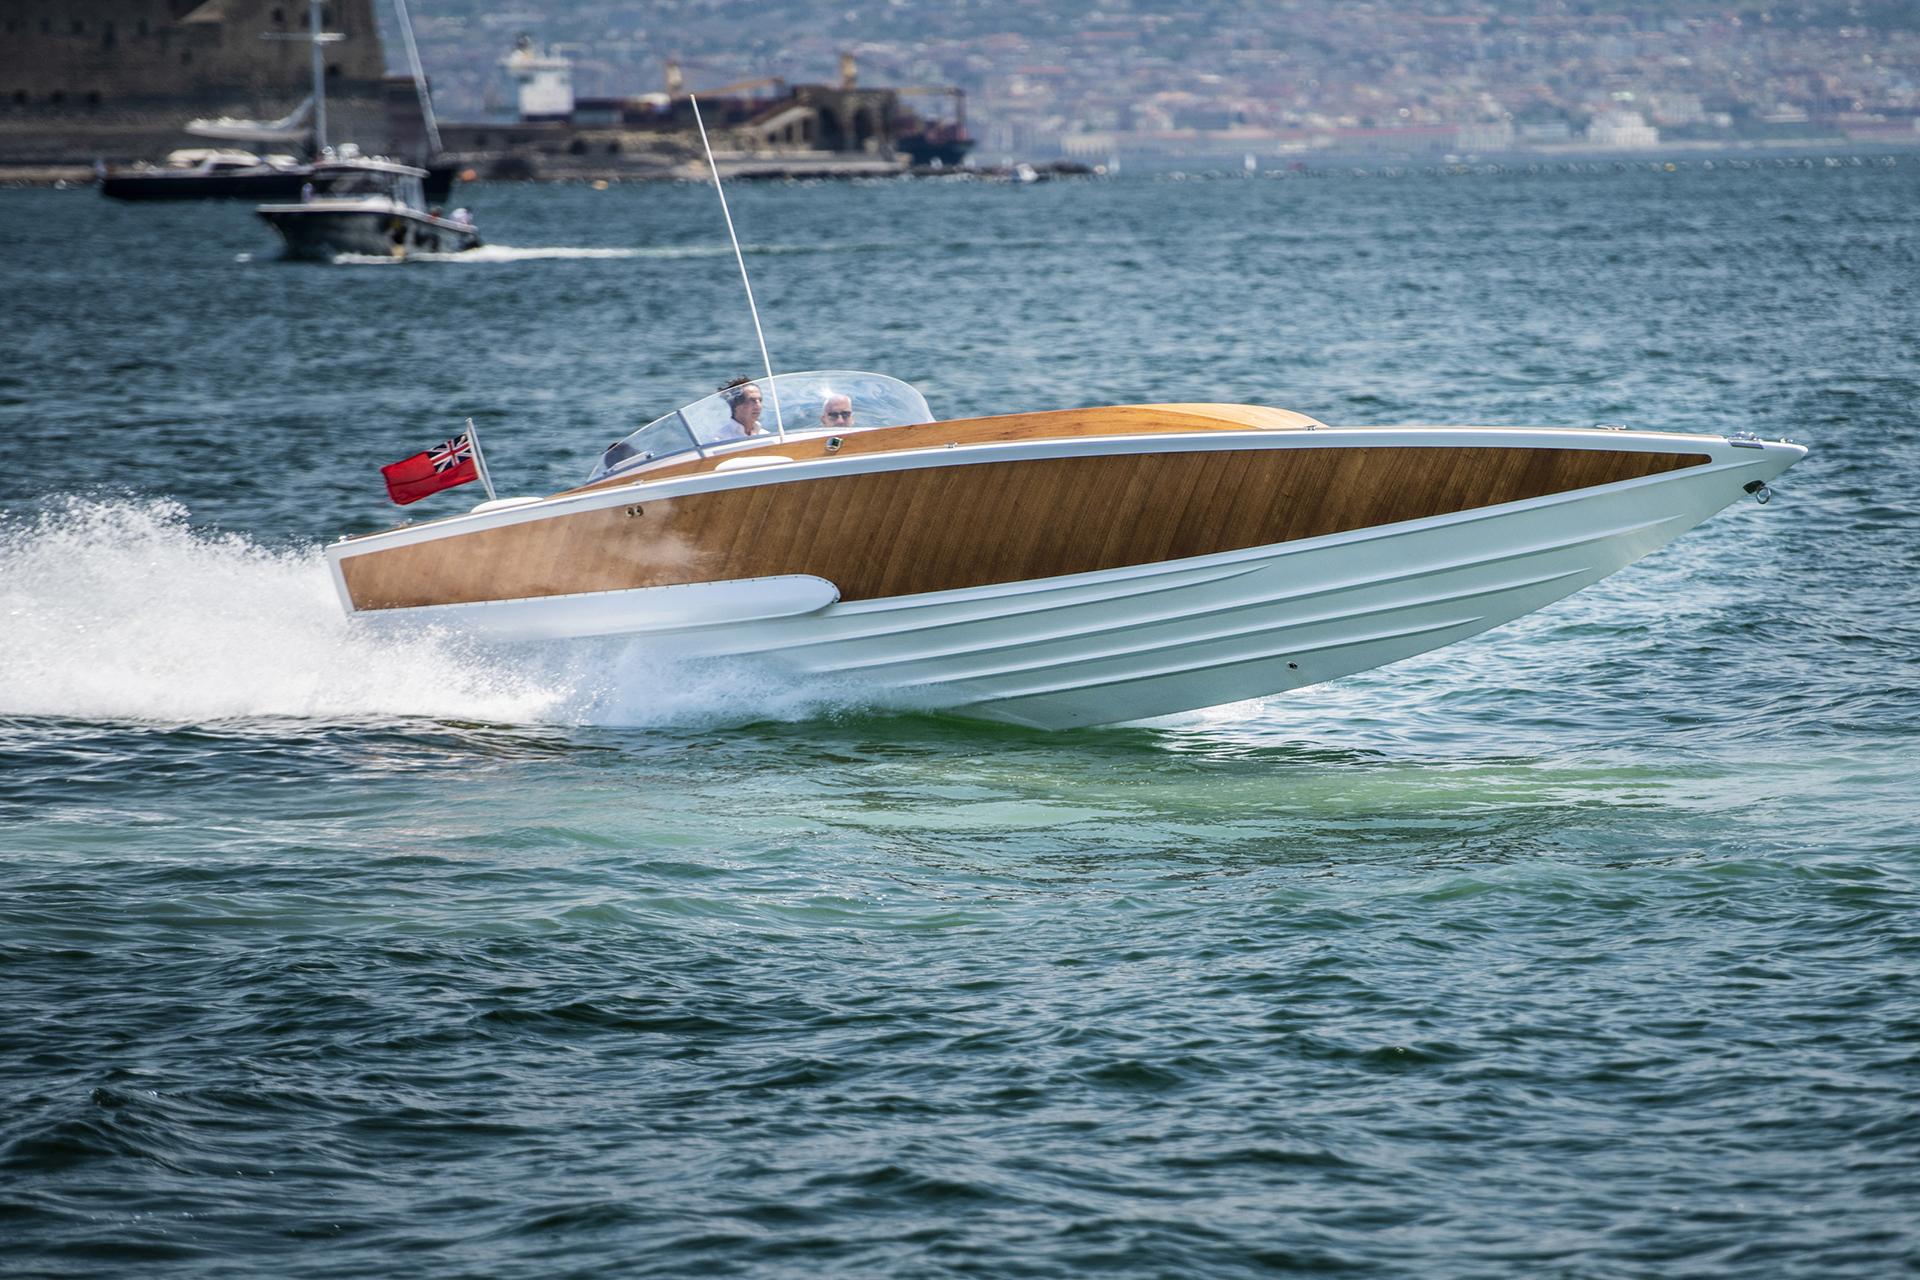 1968 Sonny Levi G. Cinquanta Day Boat